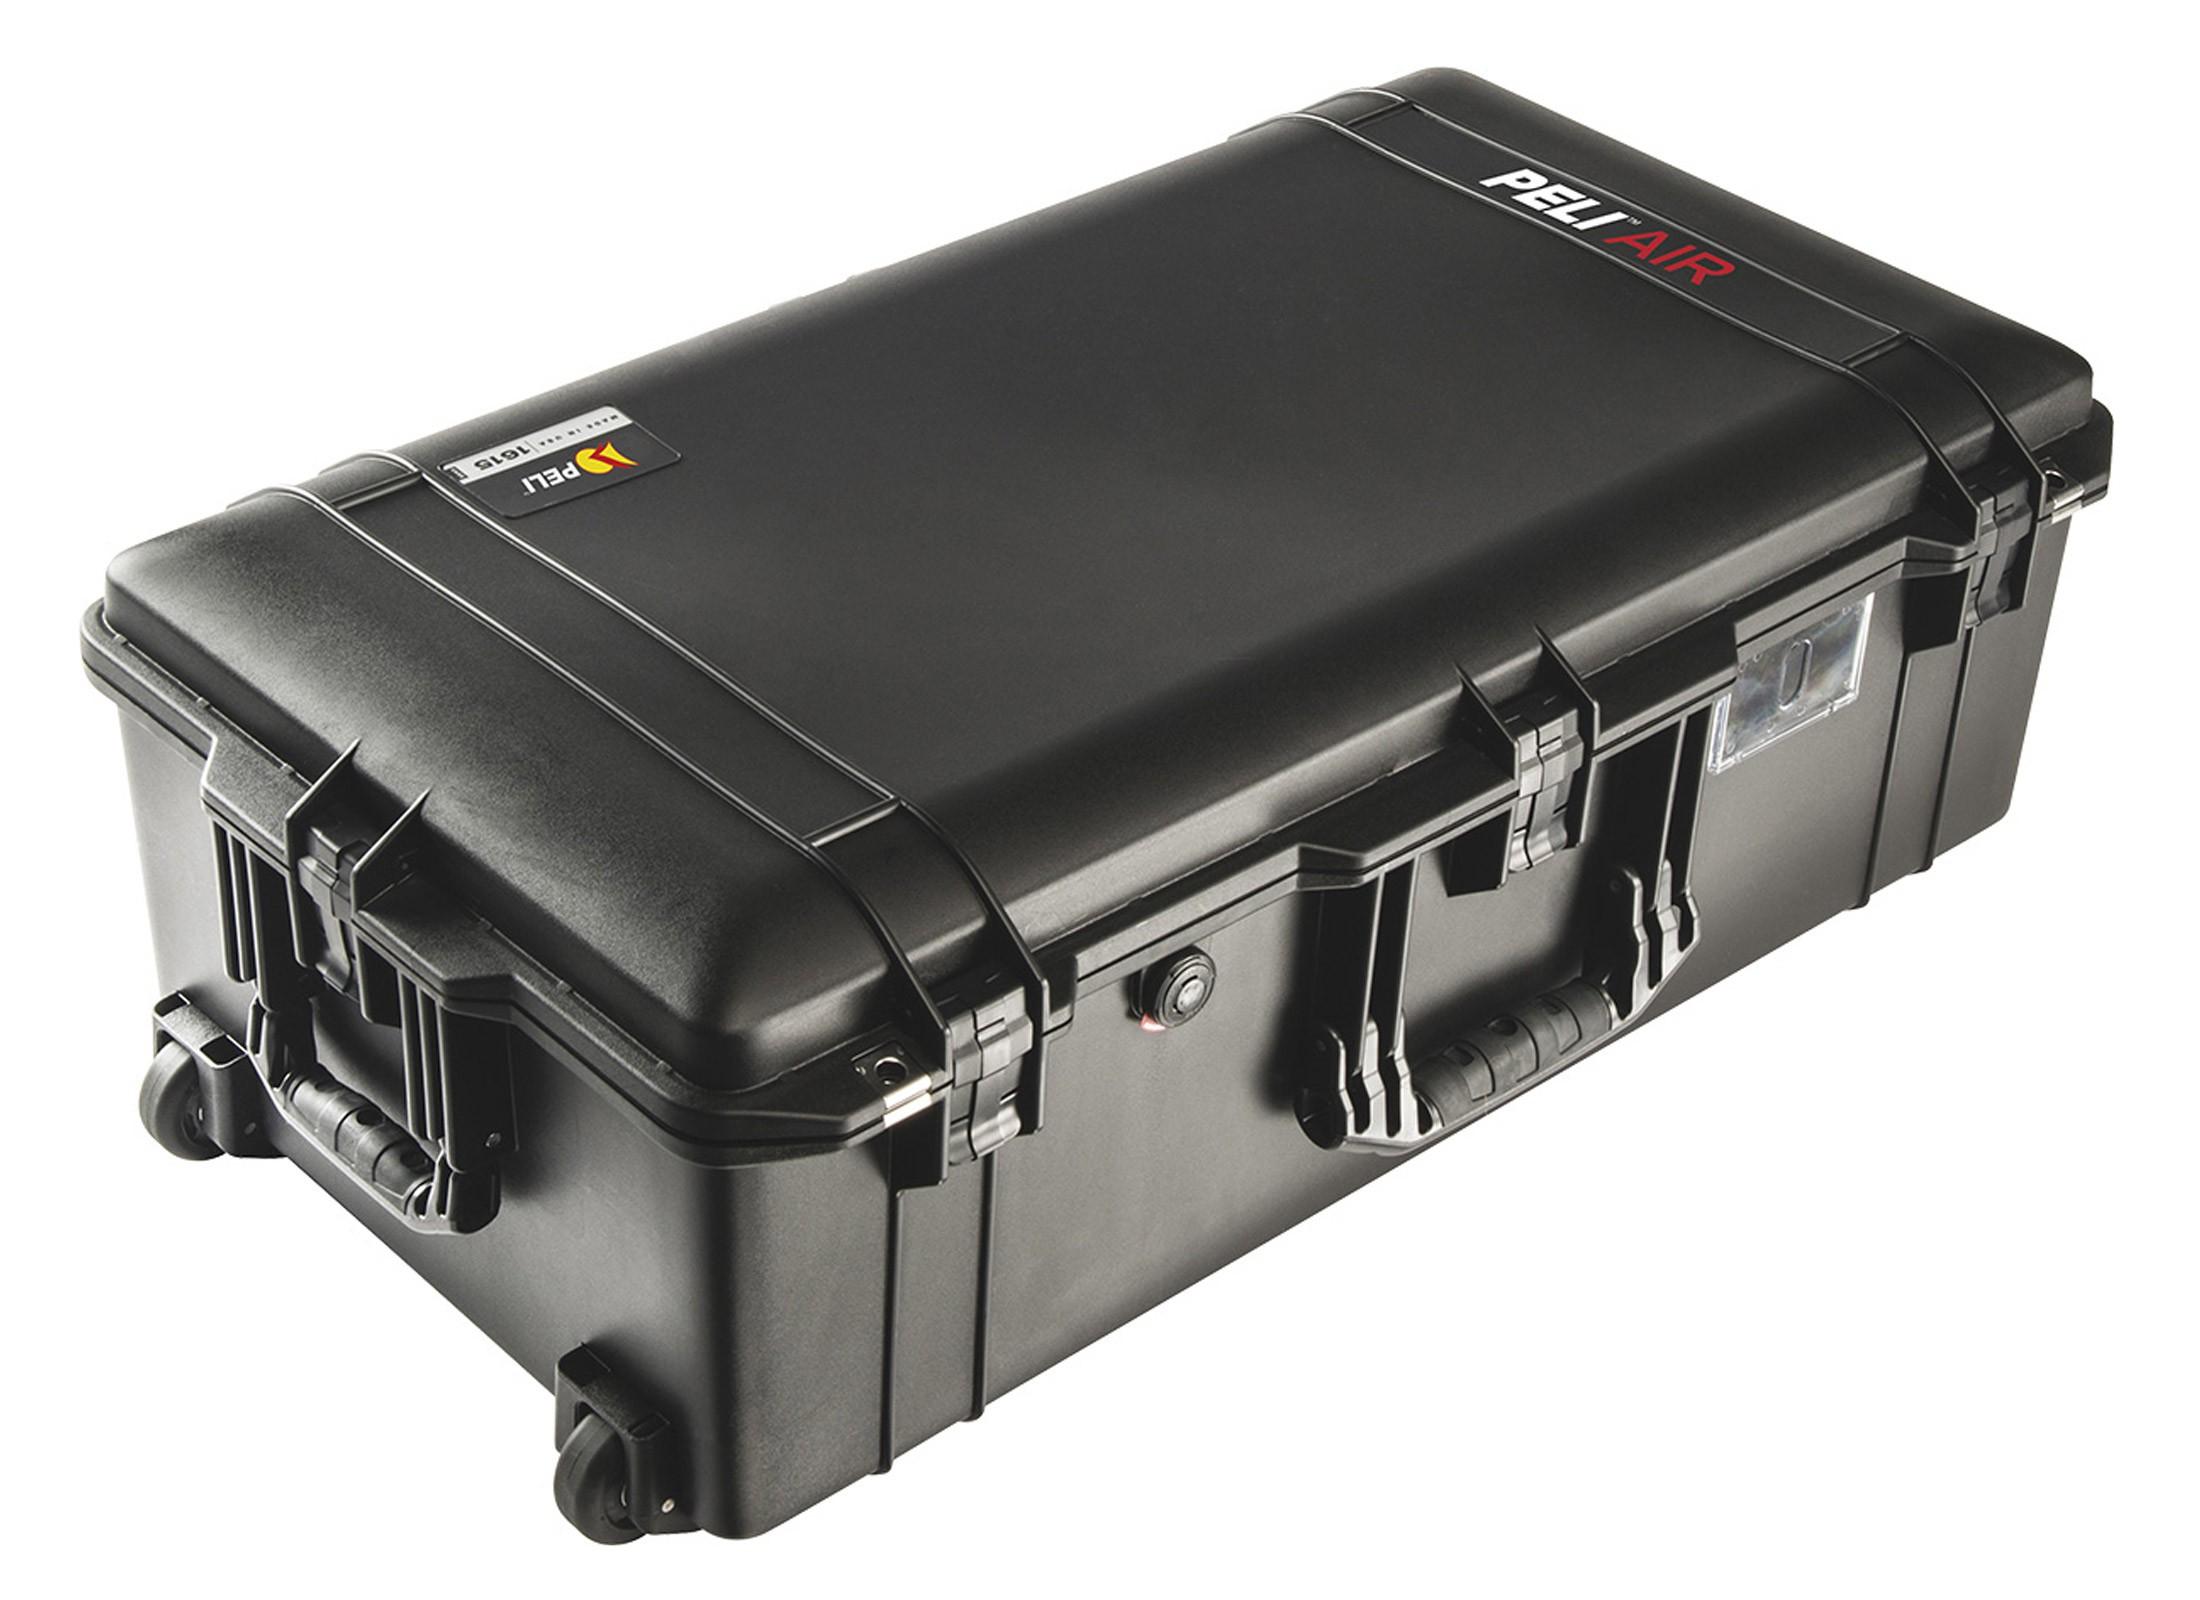 Peli Air 16150 0010 110e Equipment Case Plastic Waterproof Inside Dimension 752x394x238mm